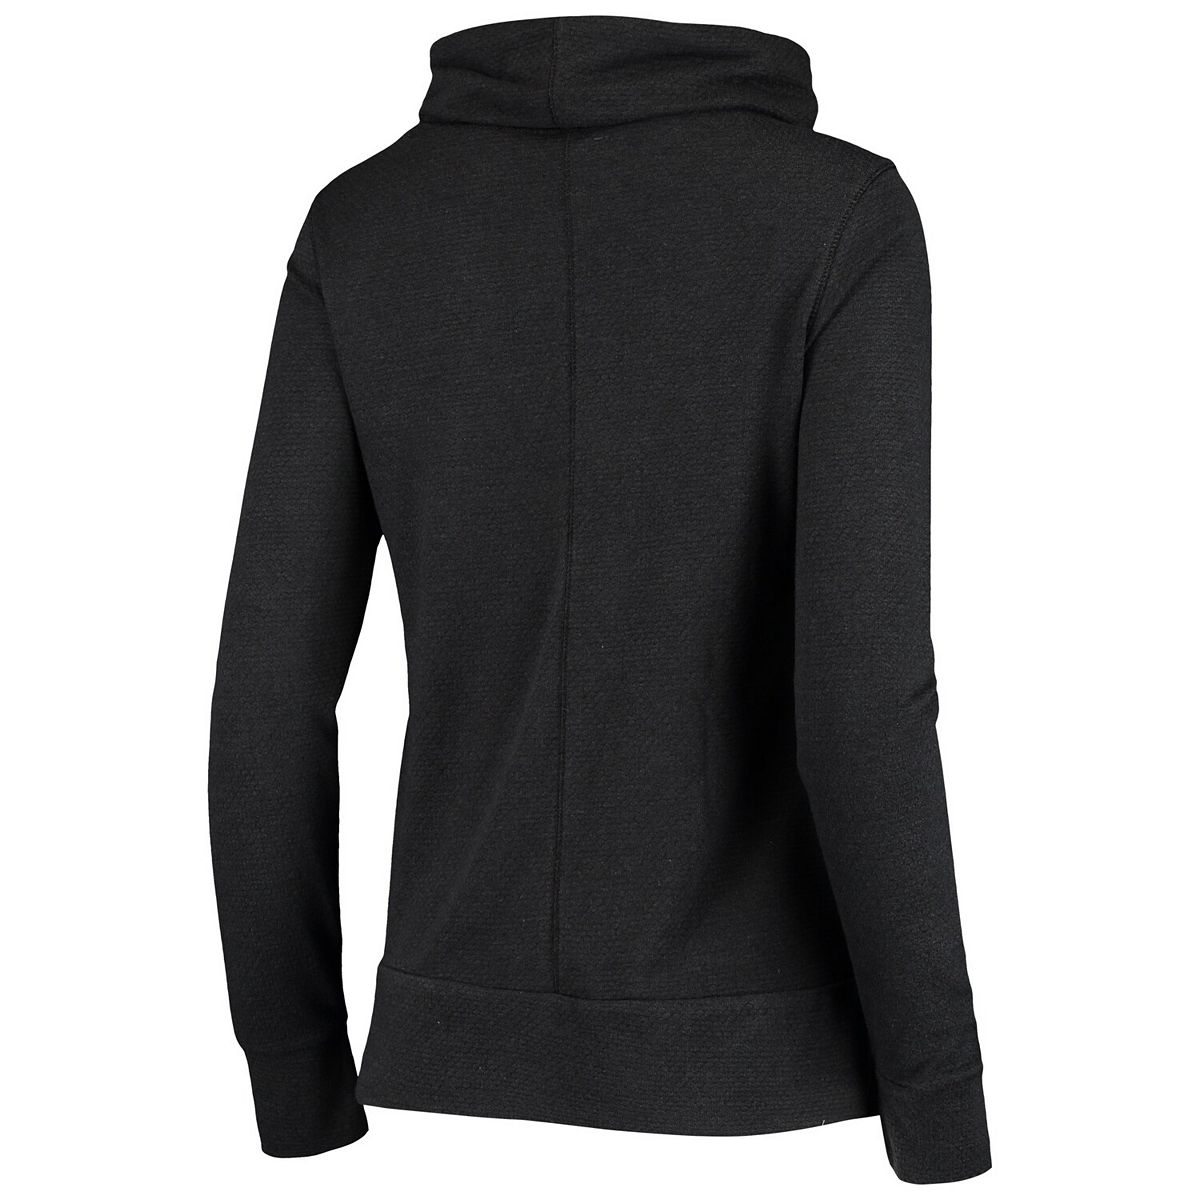 Women's Antigua Black Minnesota United FC Caliber Sweatshirt 6a2R8